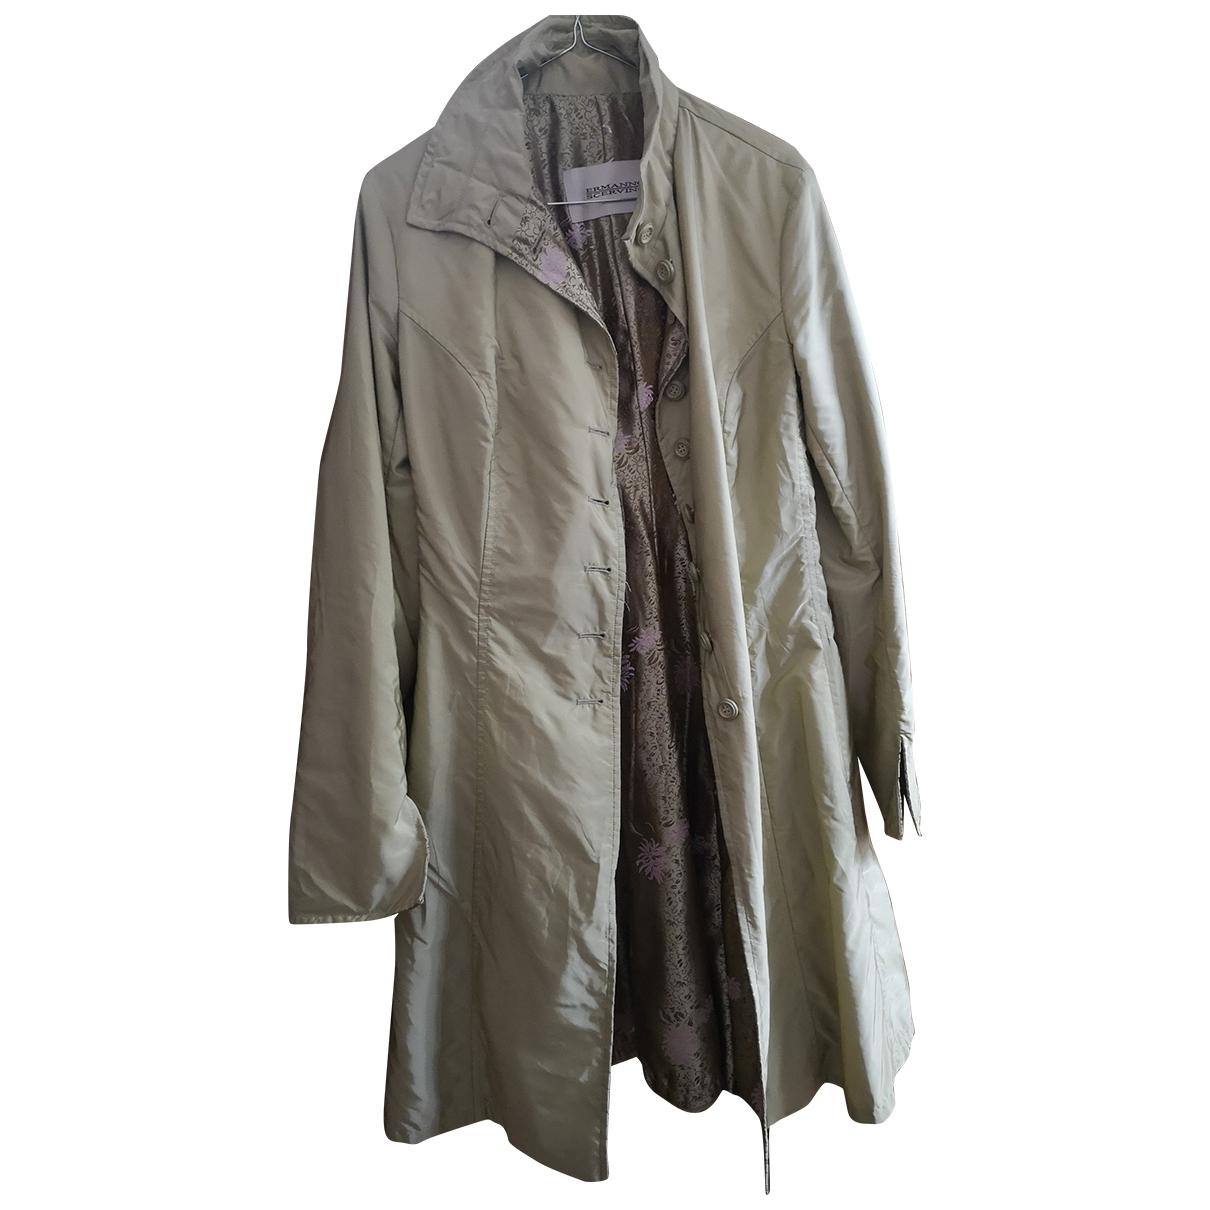 Ermanno Scervino \N Beige Trench coat for Women 42 FR